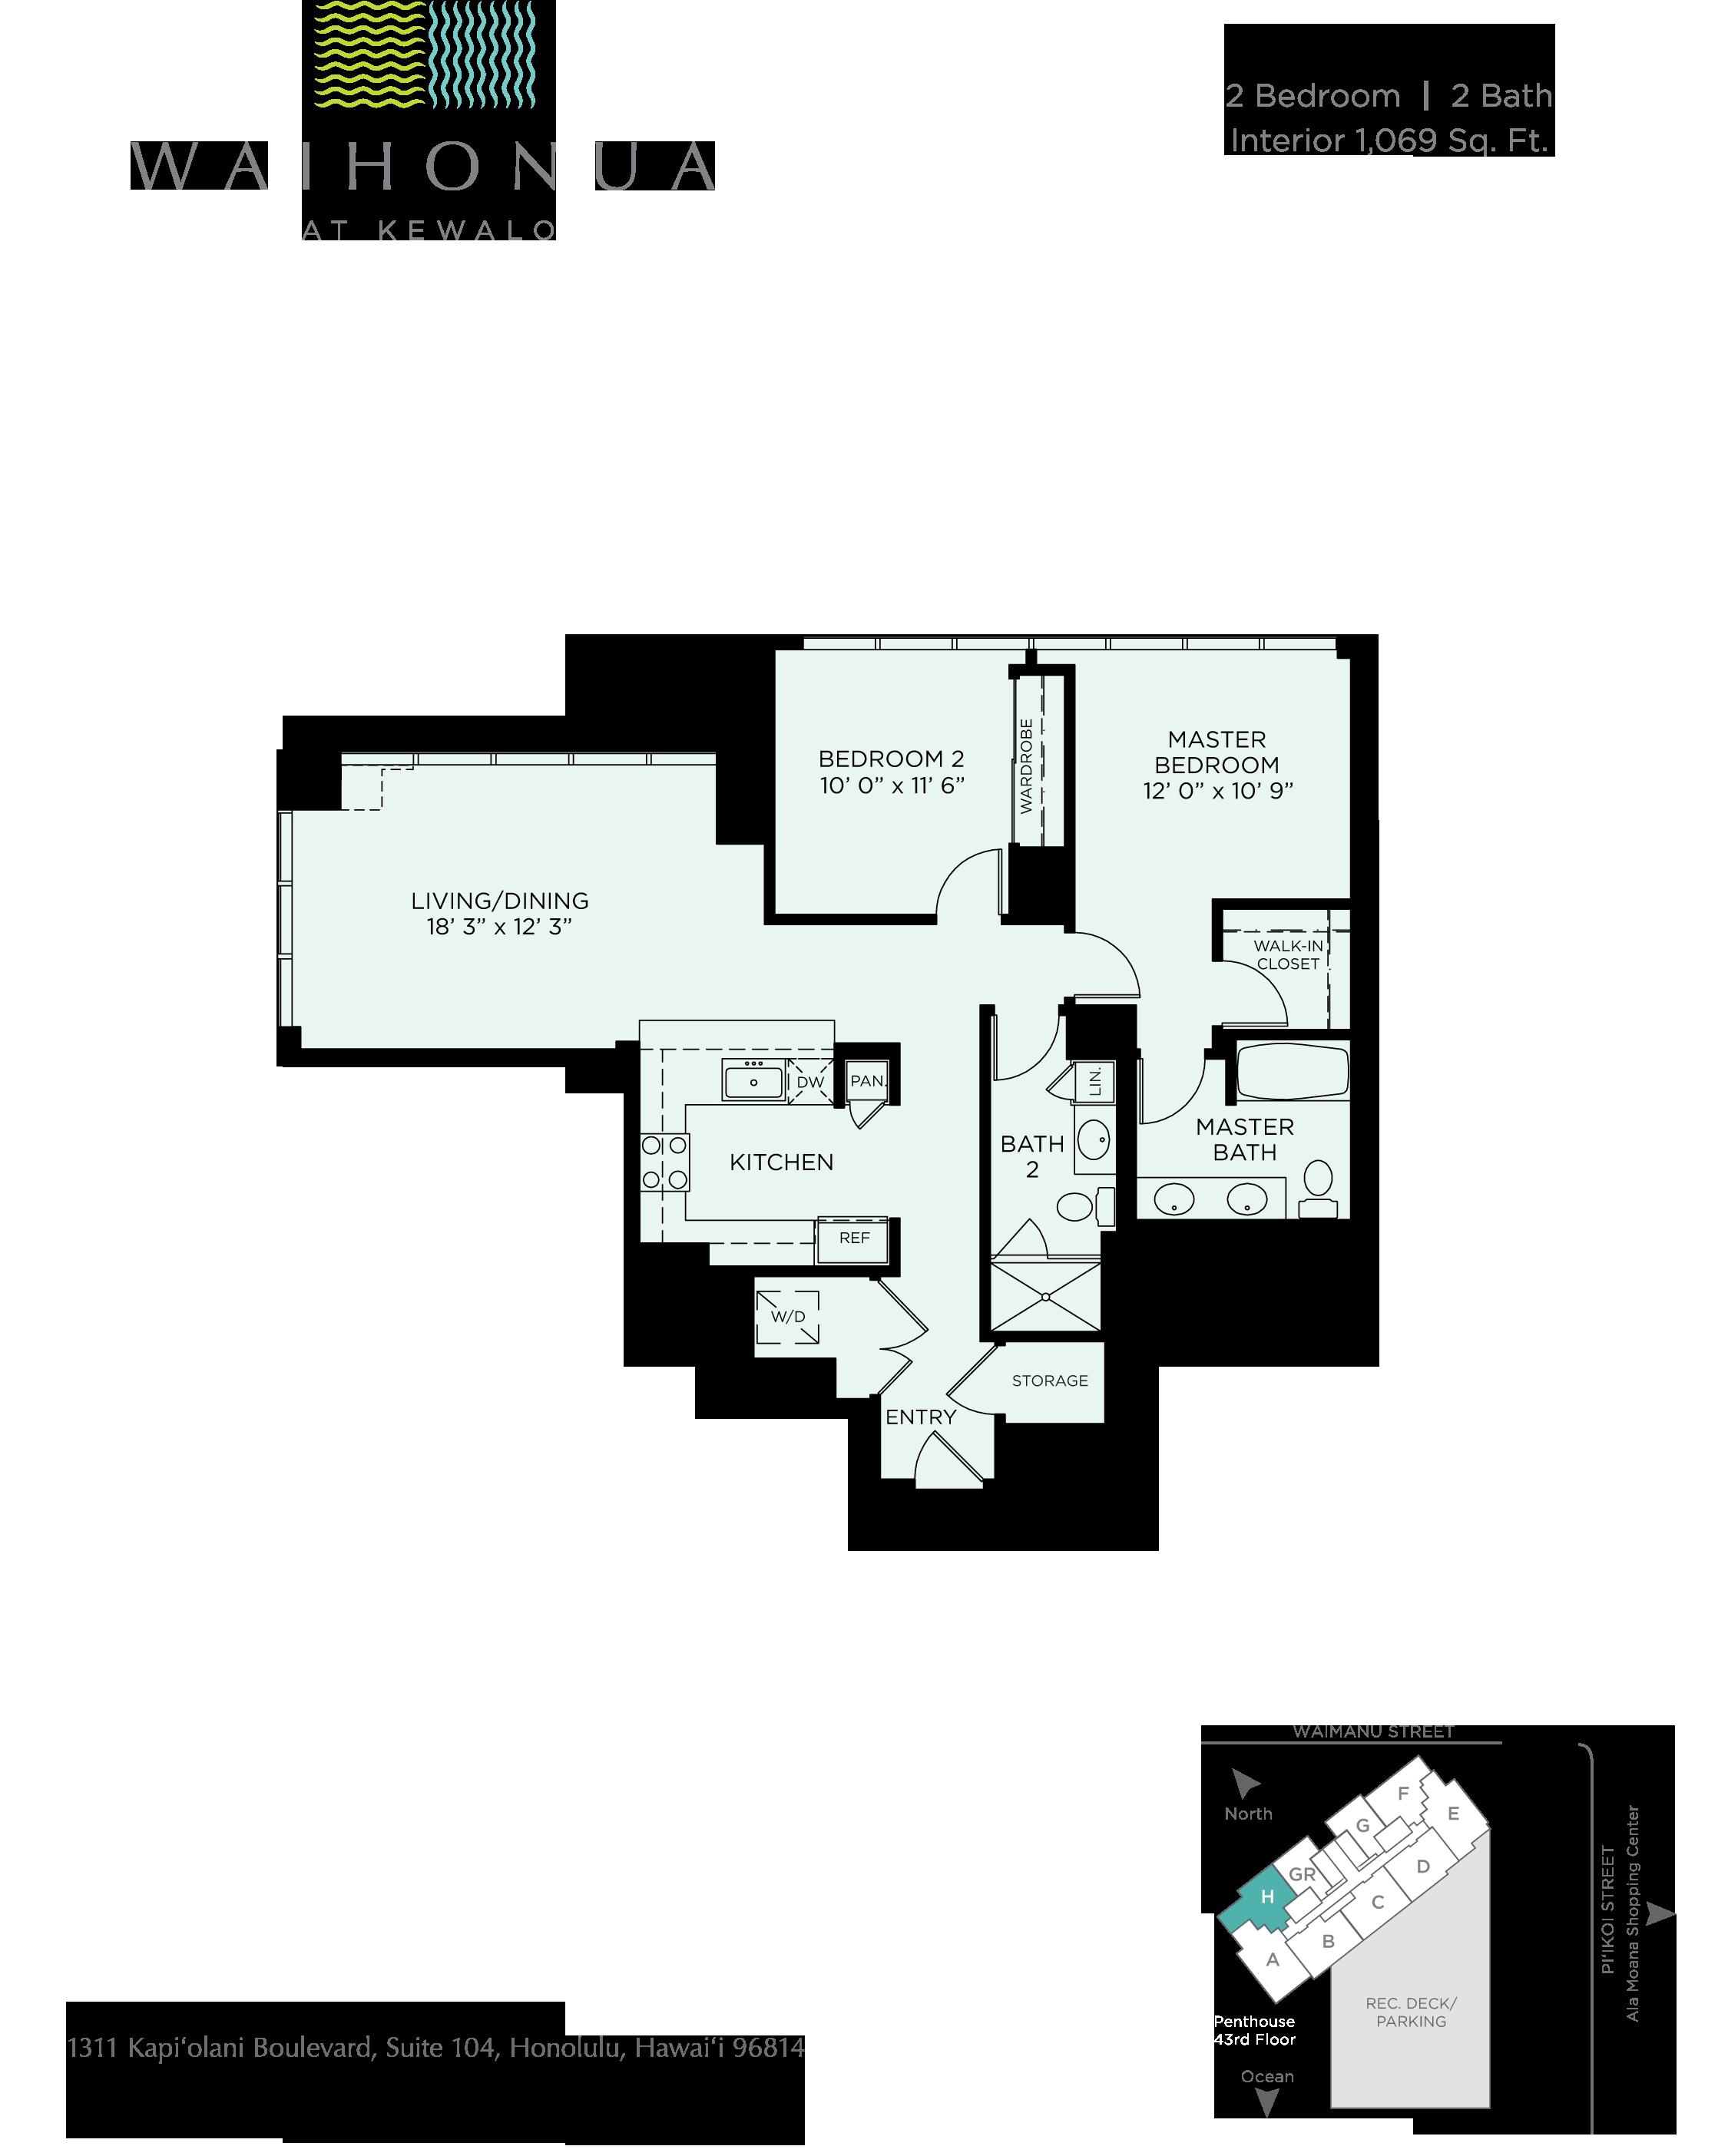 Waihonua Floor Plan H